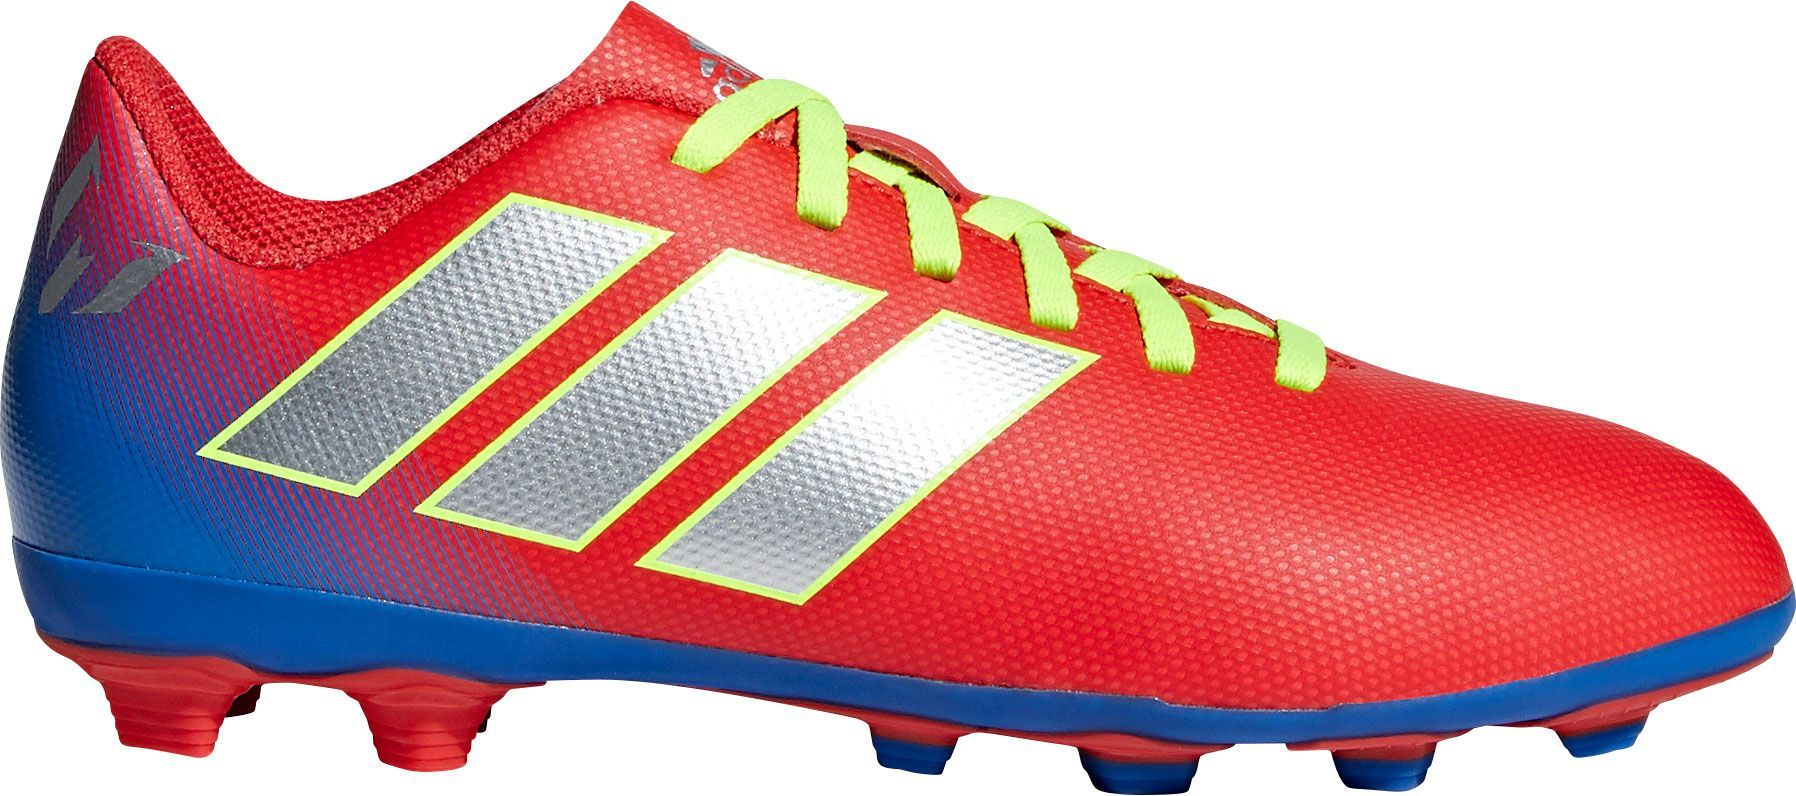 fabae678e adidas Kids' Nemeziz Messi 18.4 FXG Soccer Cleats, Boy's | Products ...